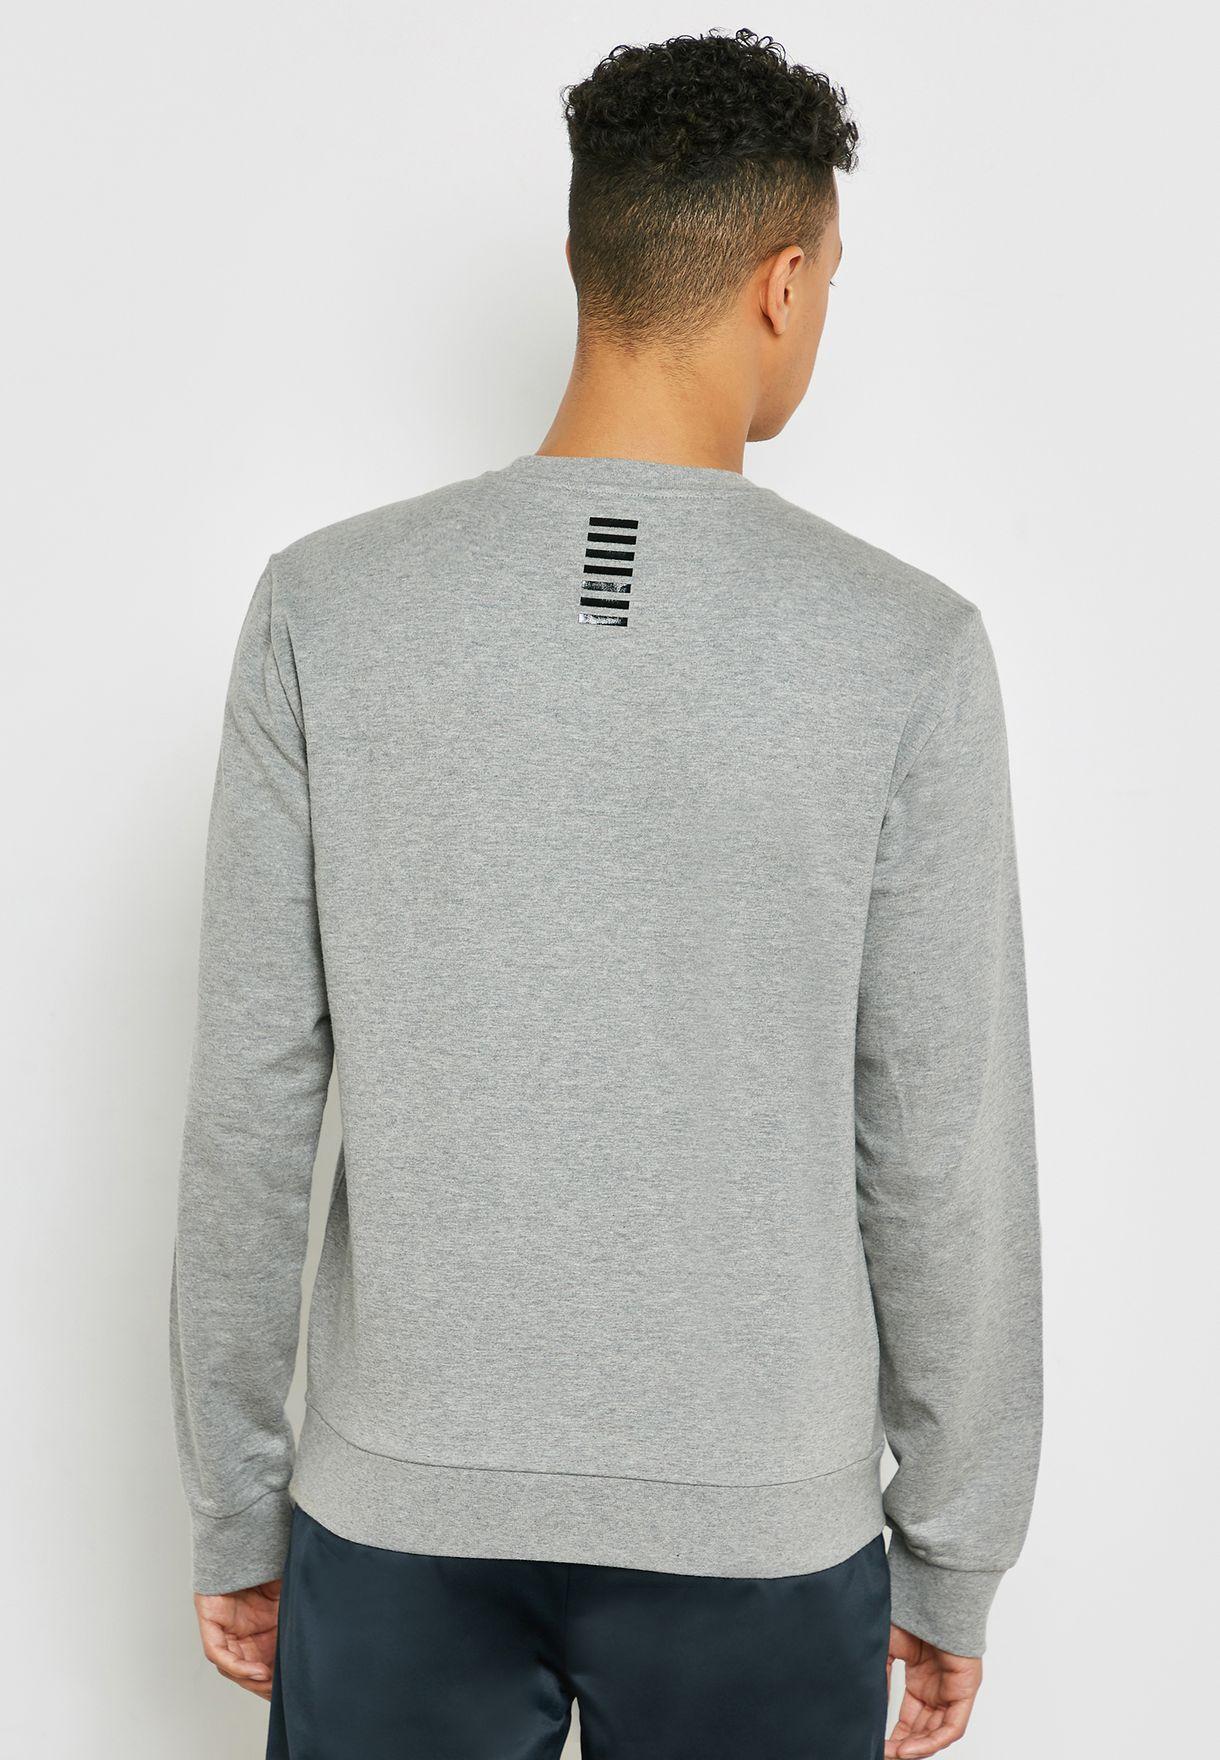 Train Core Logo Crew Neck Sweatshirt